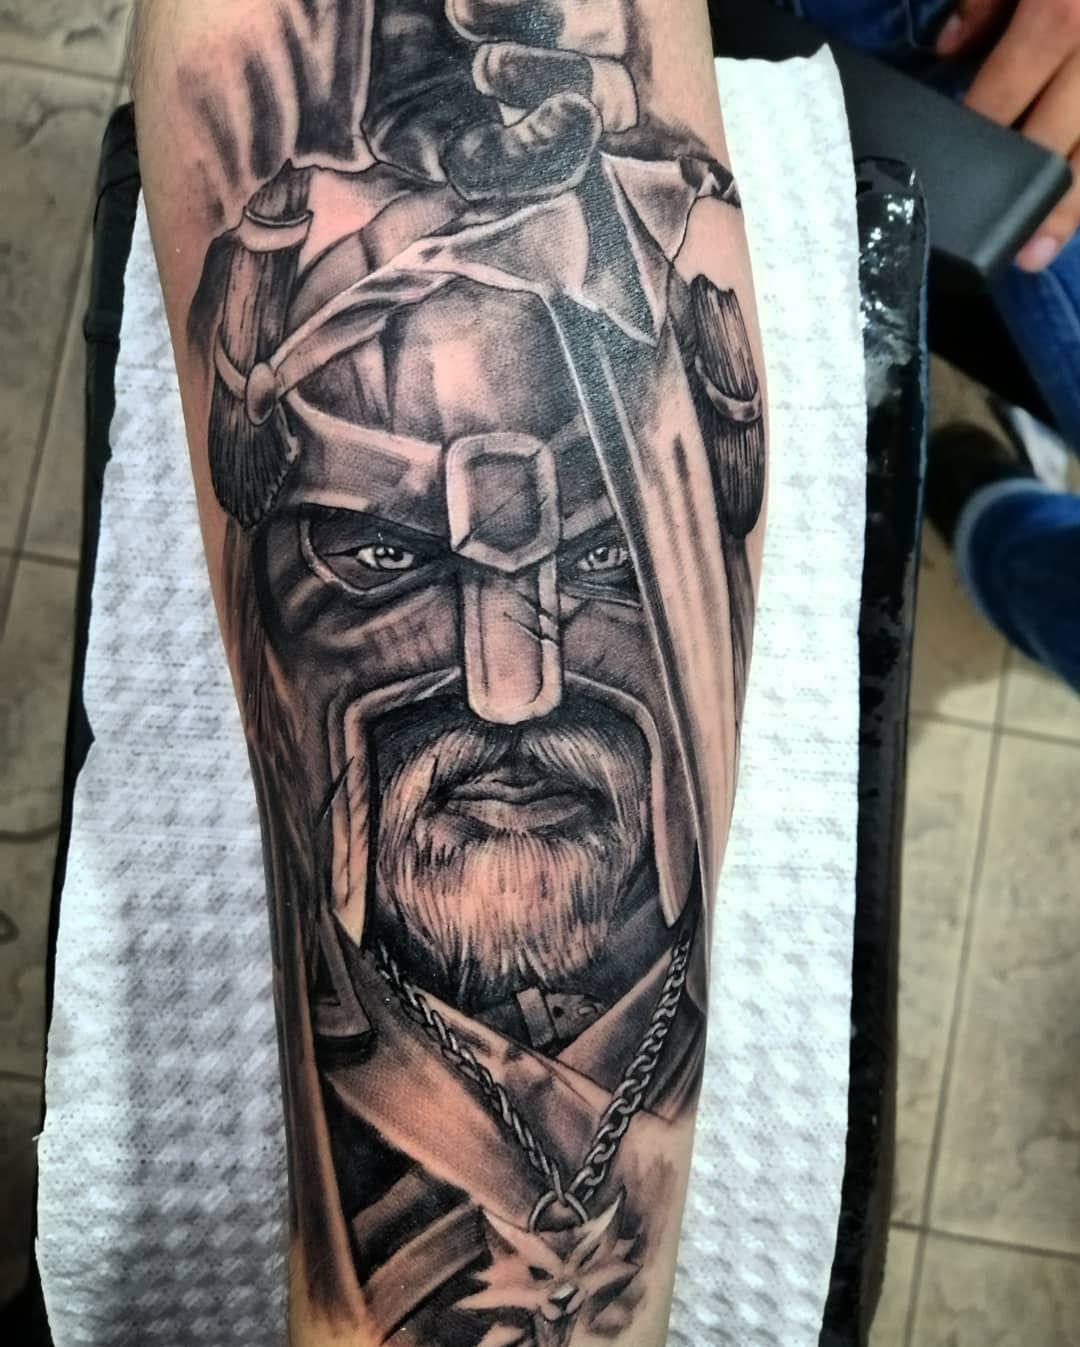 Hace un par de dias, atendiendo previa cita! Mi numero en mi perfil #viking #sword #vikingtattoo #realistictattoo #inked #tattoolife #tattooink #dinamicink